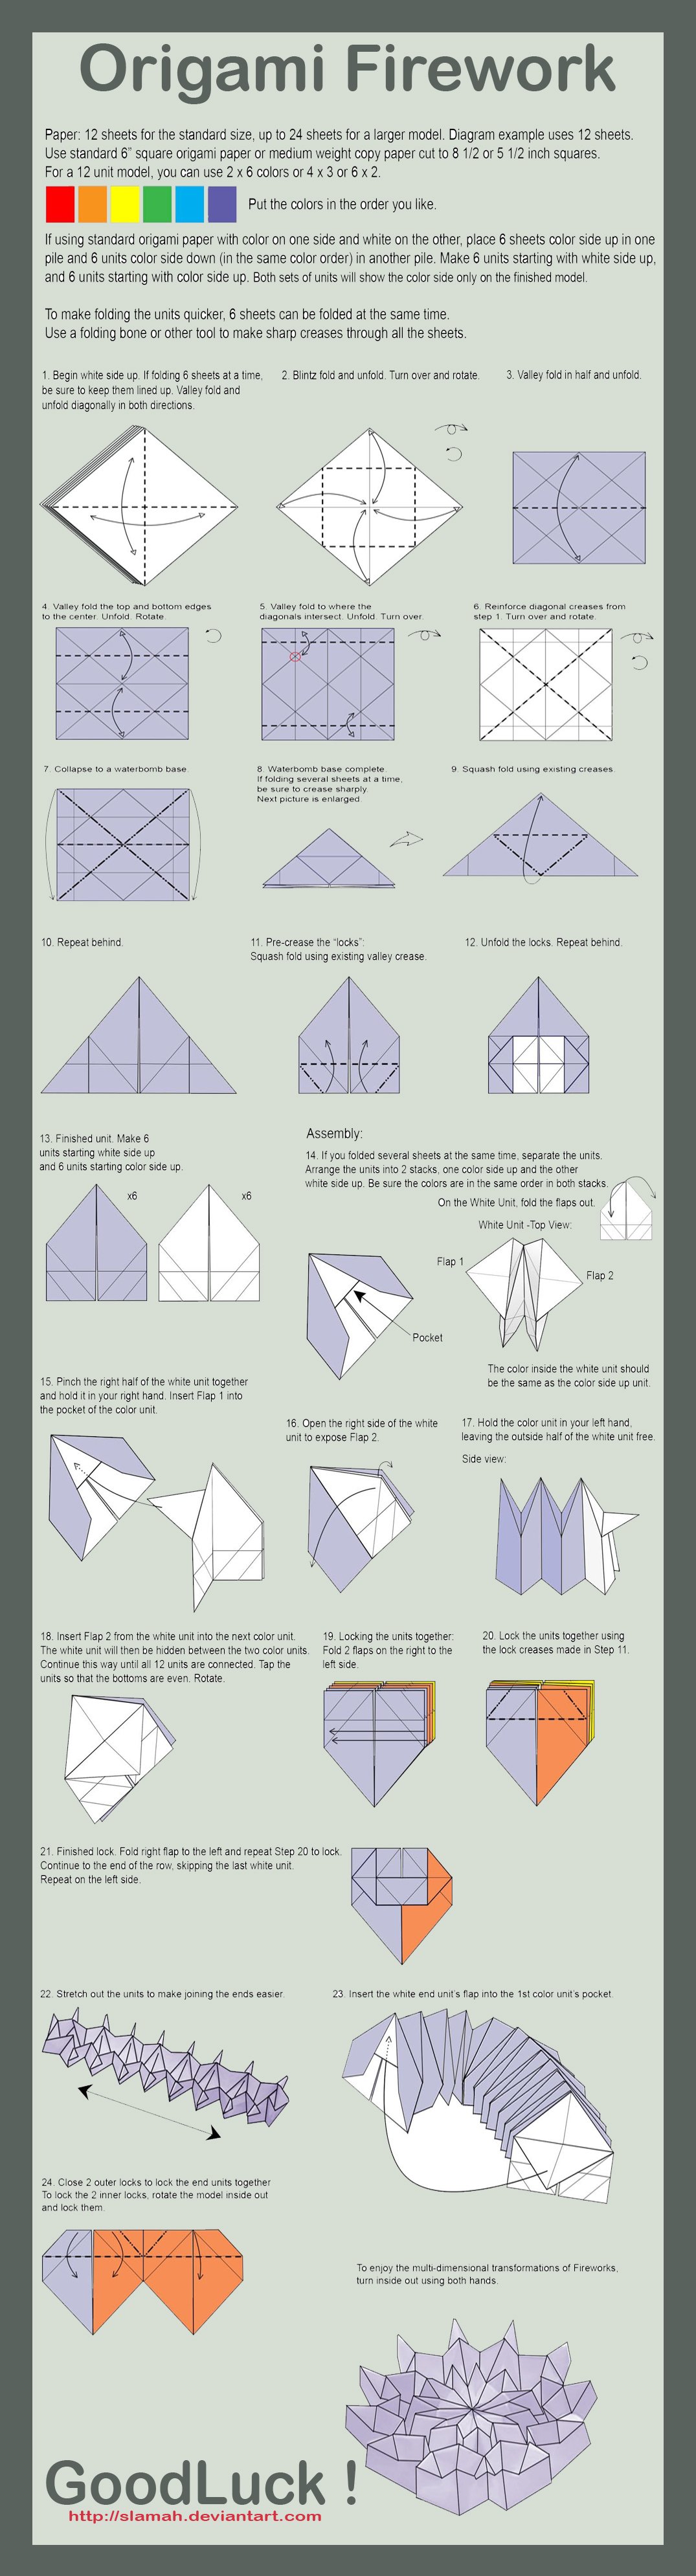 origami firework folding instructions origami instruction rh pinterest com Origami Intructions with Fireworks Magic 3D Origami Firework